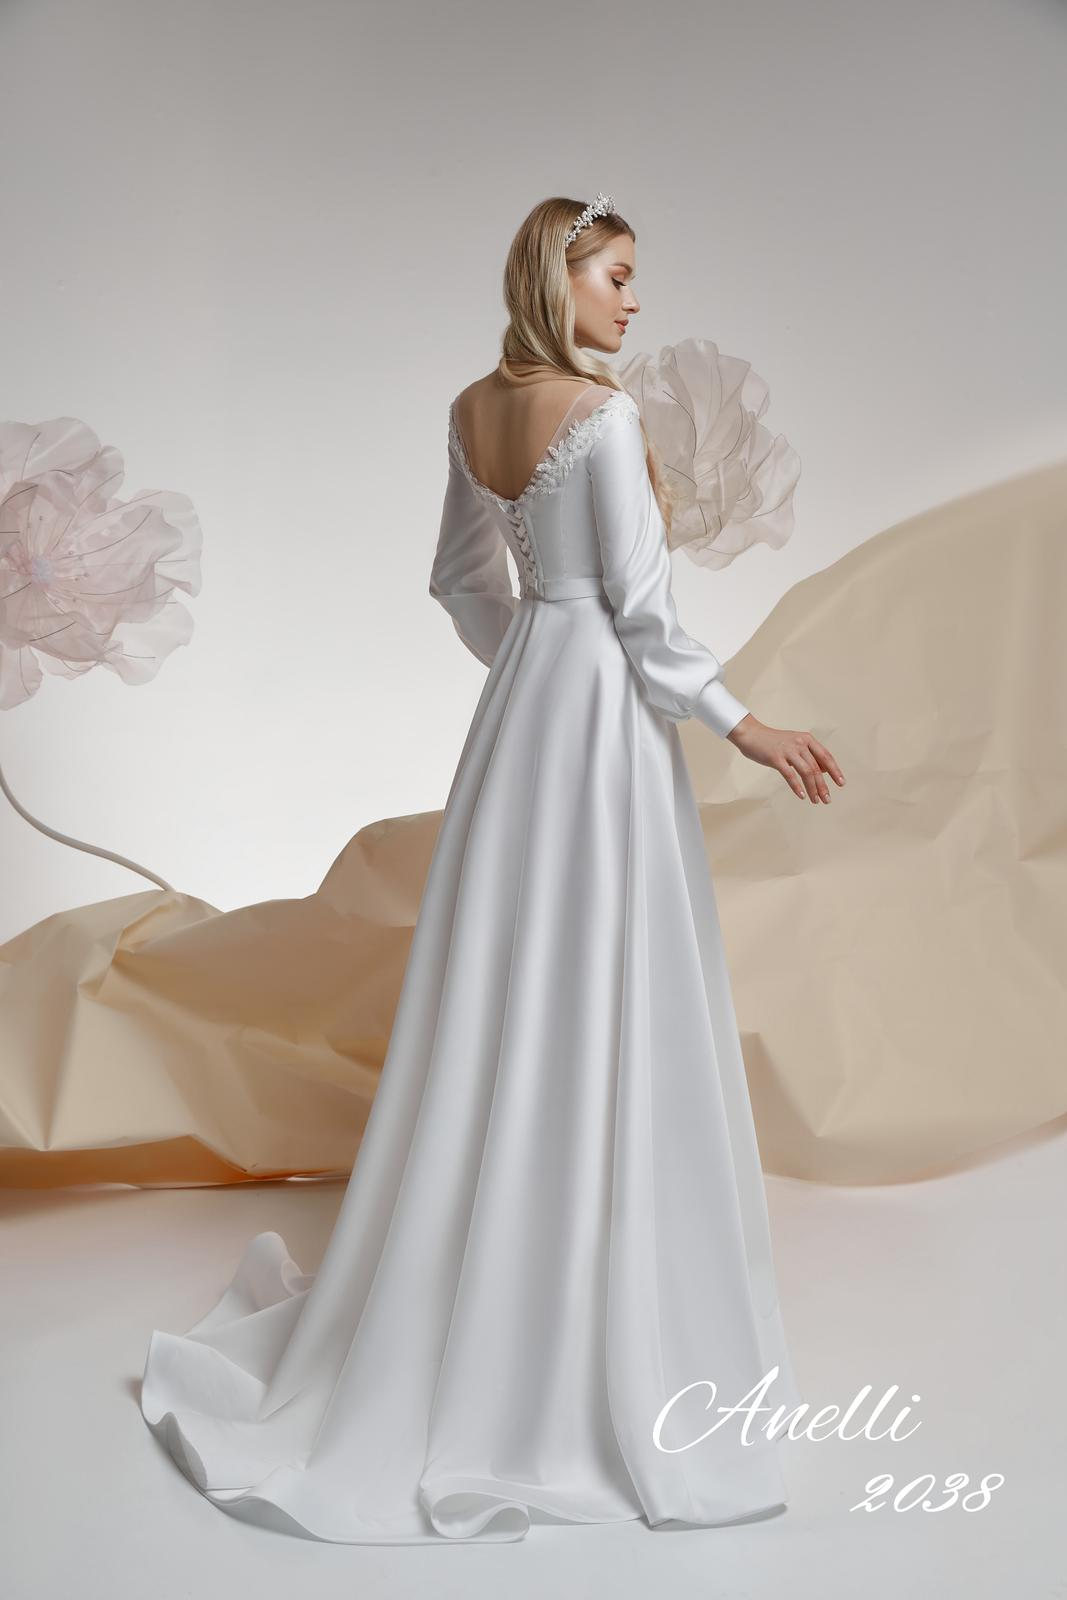 Svadobné šaty - Imagine 2038 - Obrázok č. 1